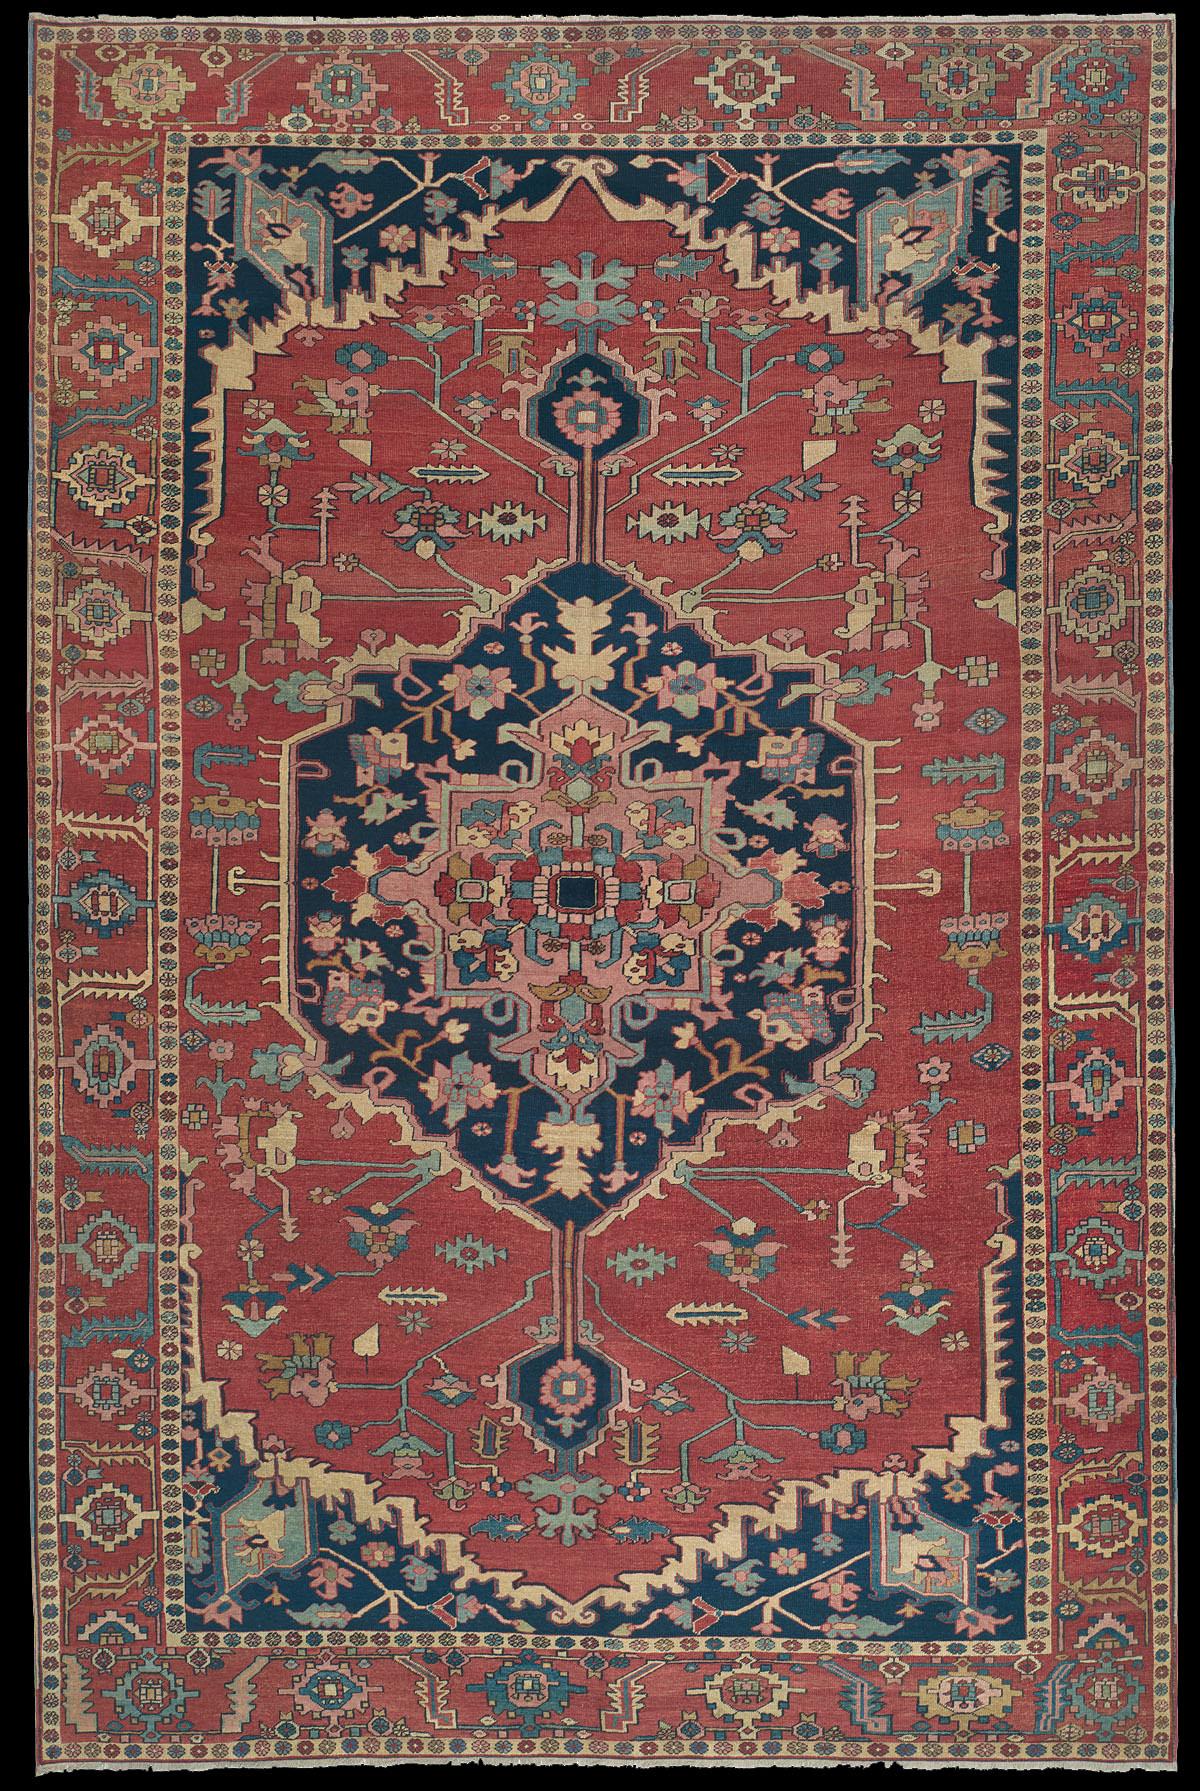 Antique Serapi Rug Azerbaijan Nw Iran 19th Century 9 39 1